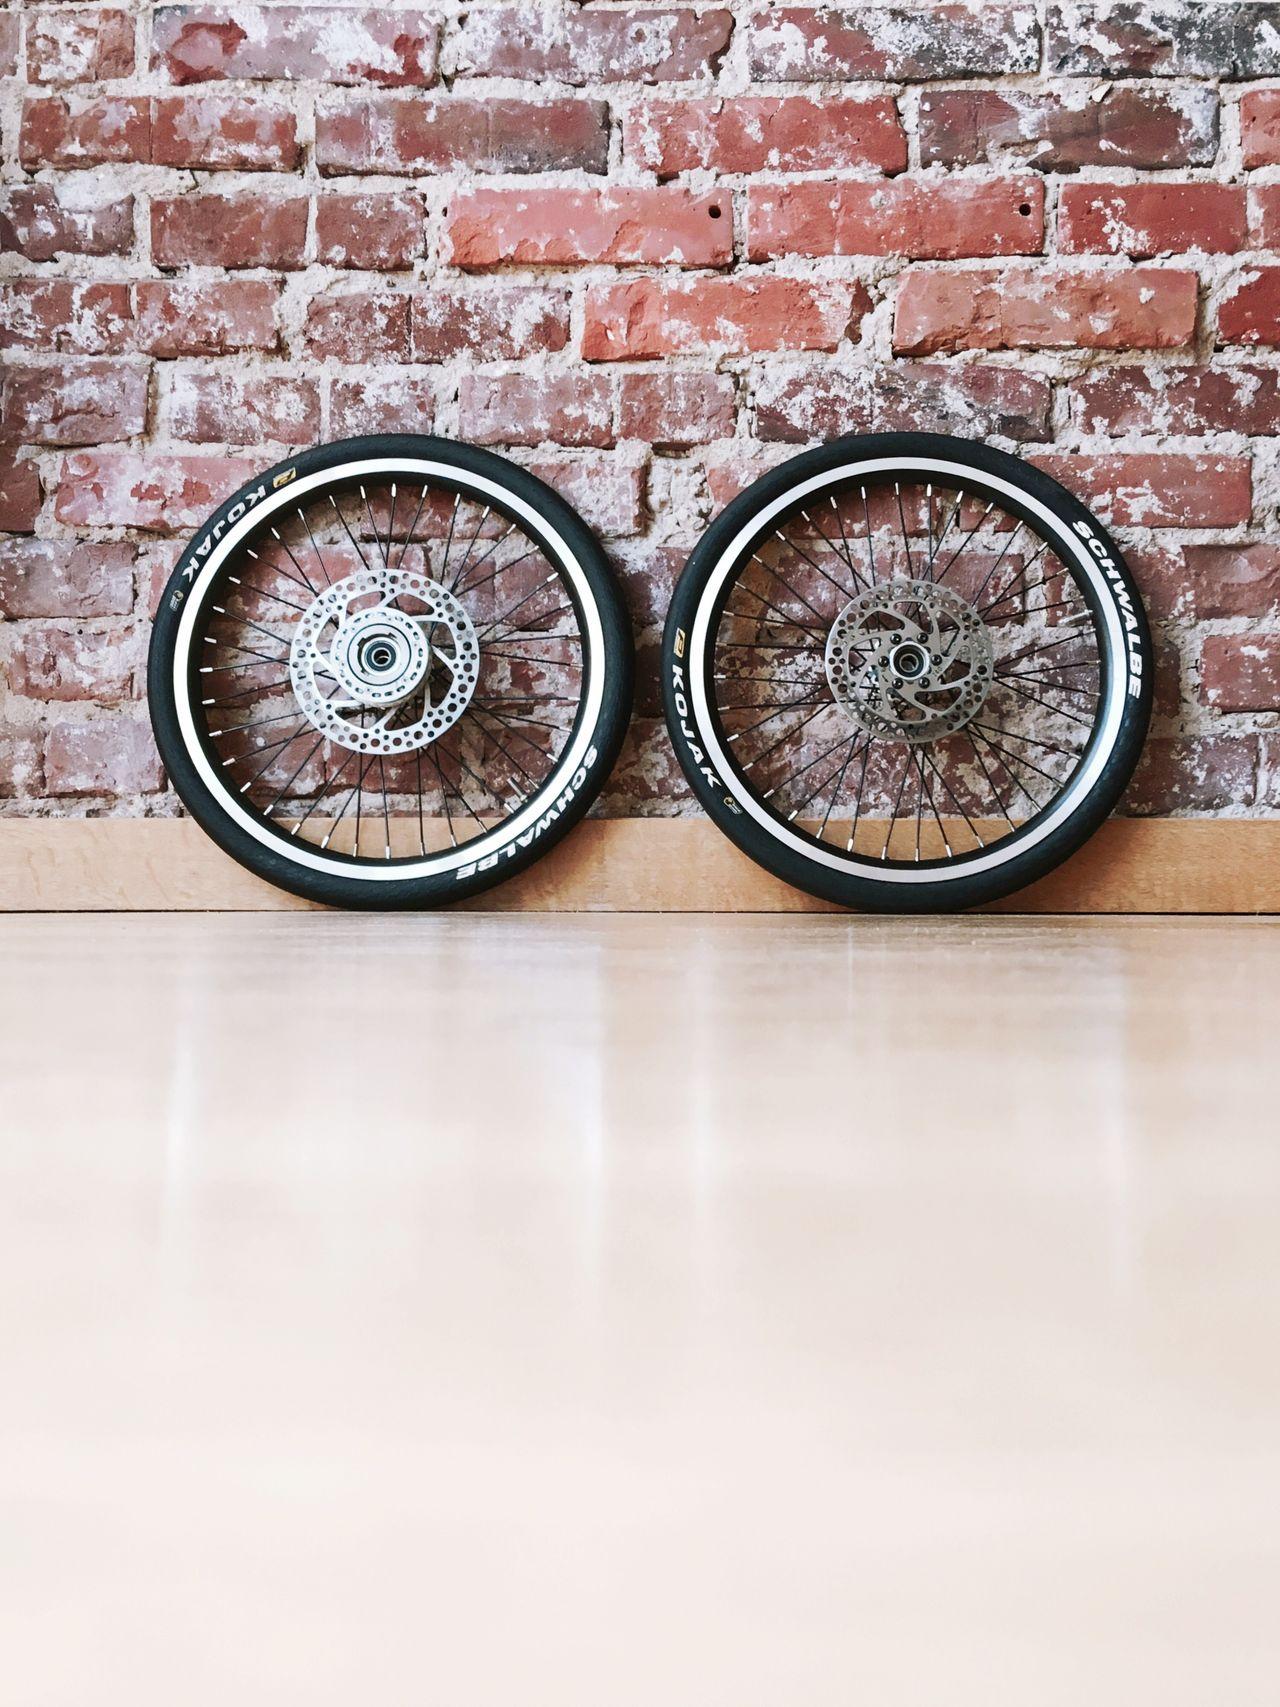 Bike Cycle Cycling Bikesaroundtheworld Bicycle Folding Bike Folder Strida Everywhere Foldingbike Wheels Wheel Slick Slicks The Mix Up